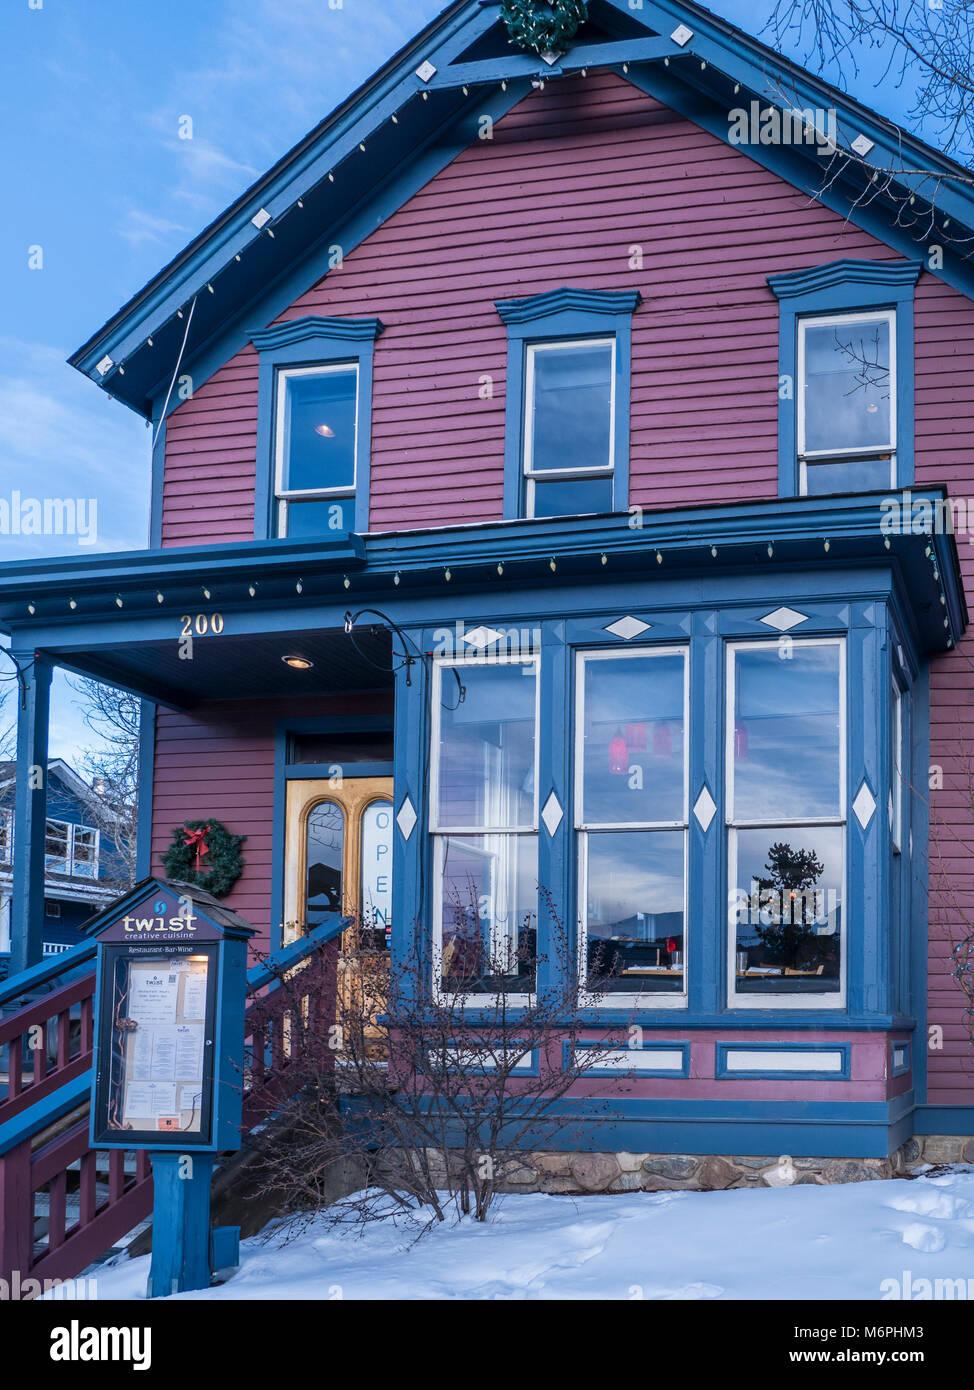 Restaurant Twist, le centre-ville de Breckenridge, Colorado. Photo Stock